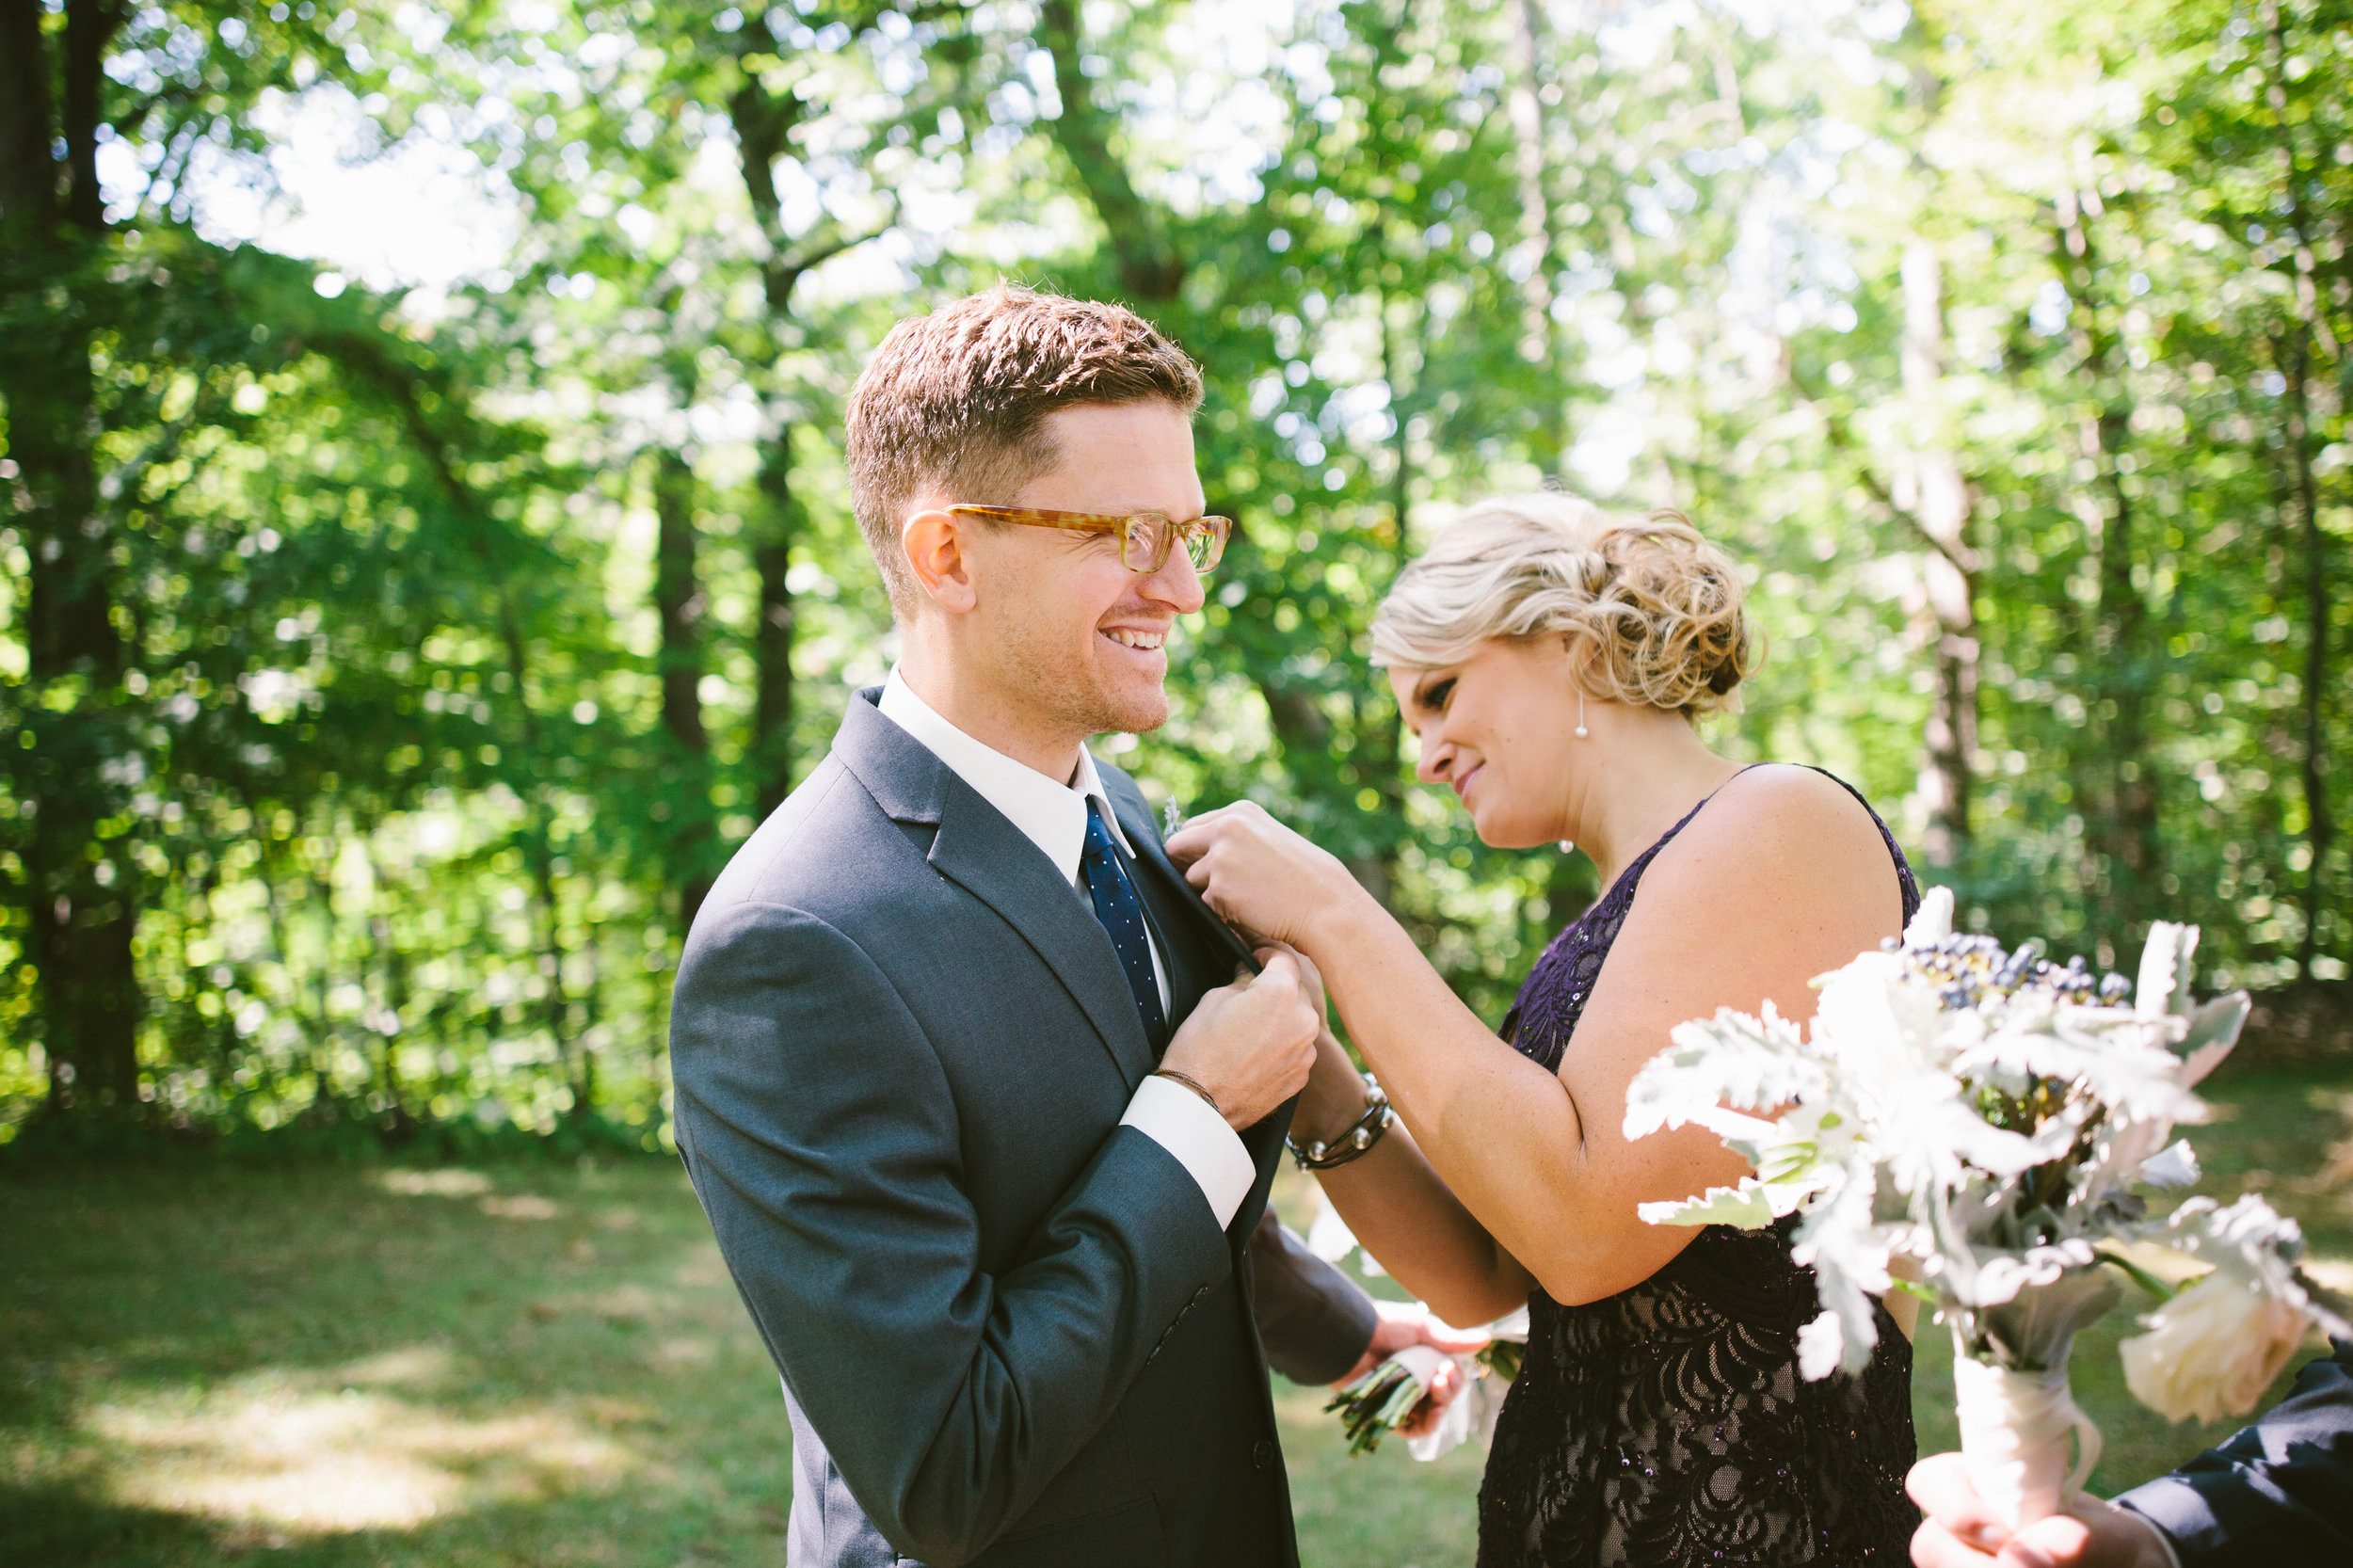 grand_rapids_wedding_rockford_wedding_richard_app_gallery_wedding_grand_rapids_wedding_photographer_summer_wedding_wabasis_lake_park_wedding_rustic_wedding-26.jpg